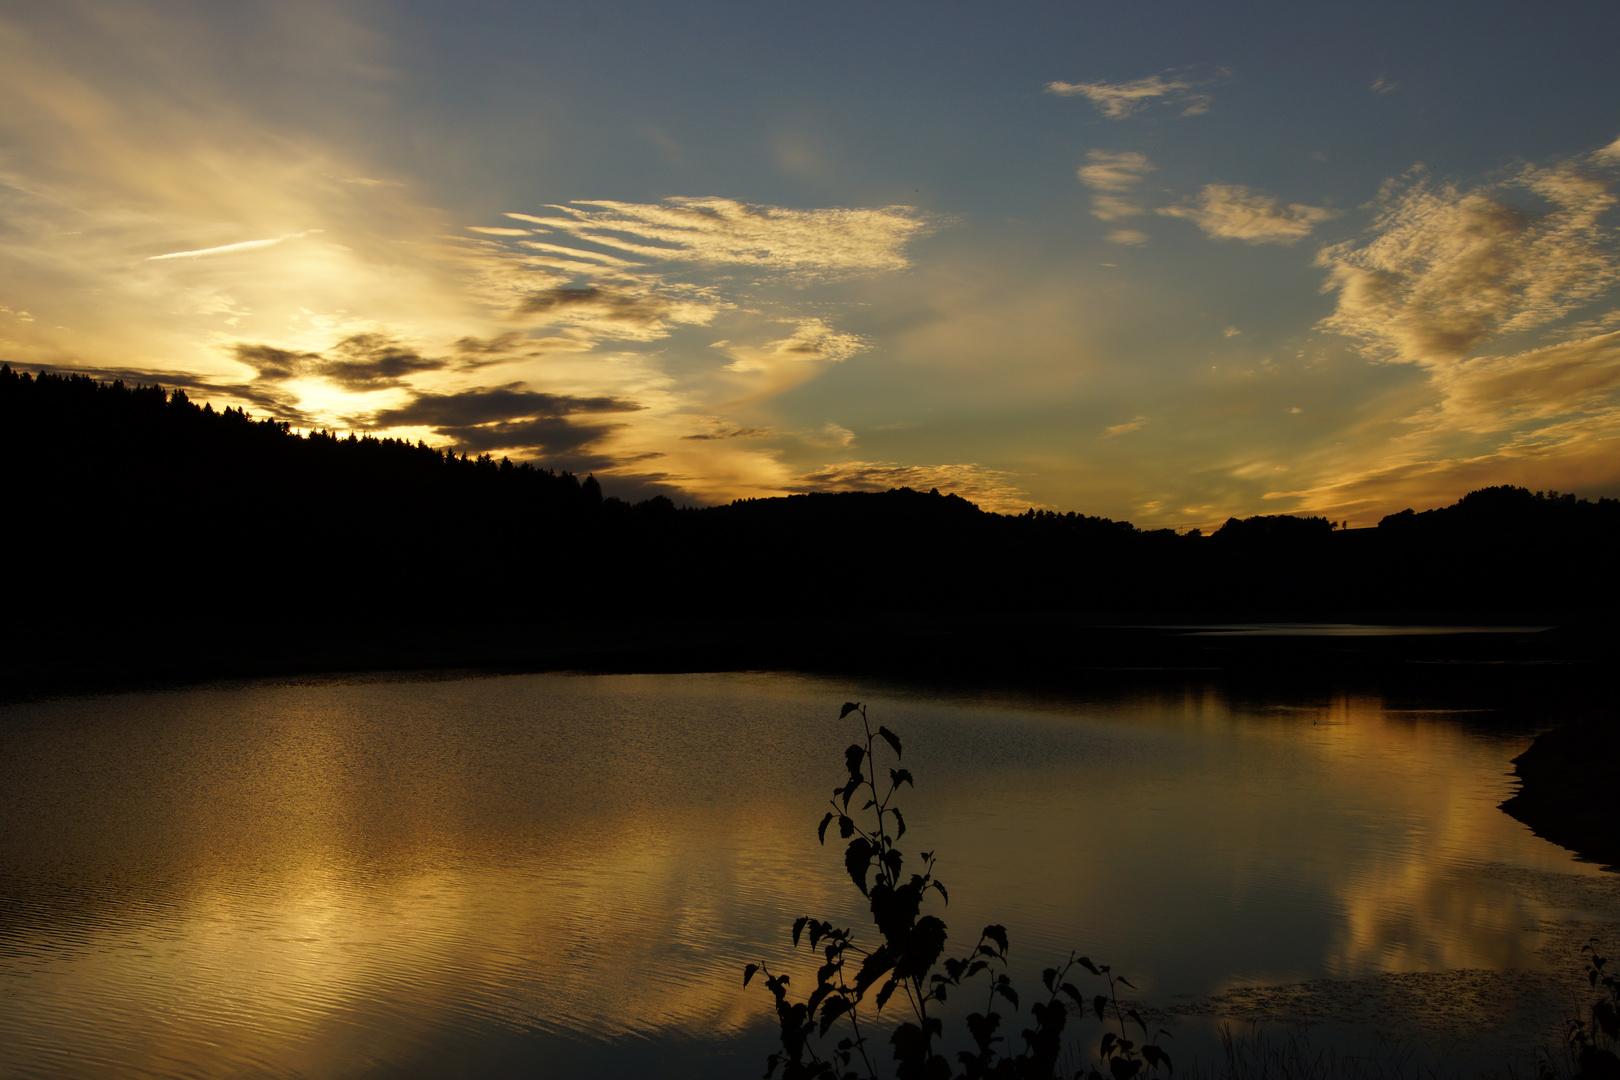 Sunset an der Wiehltalsperre